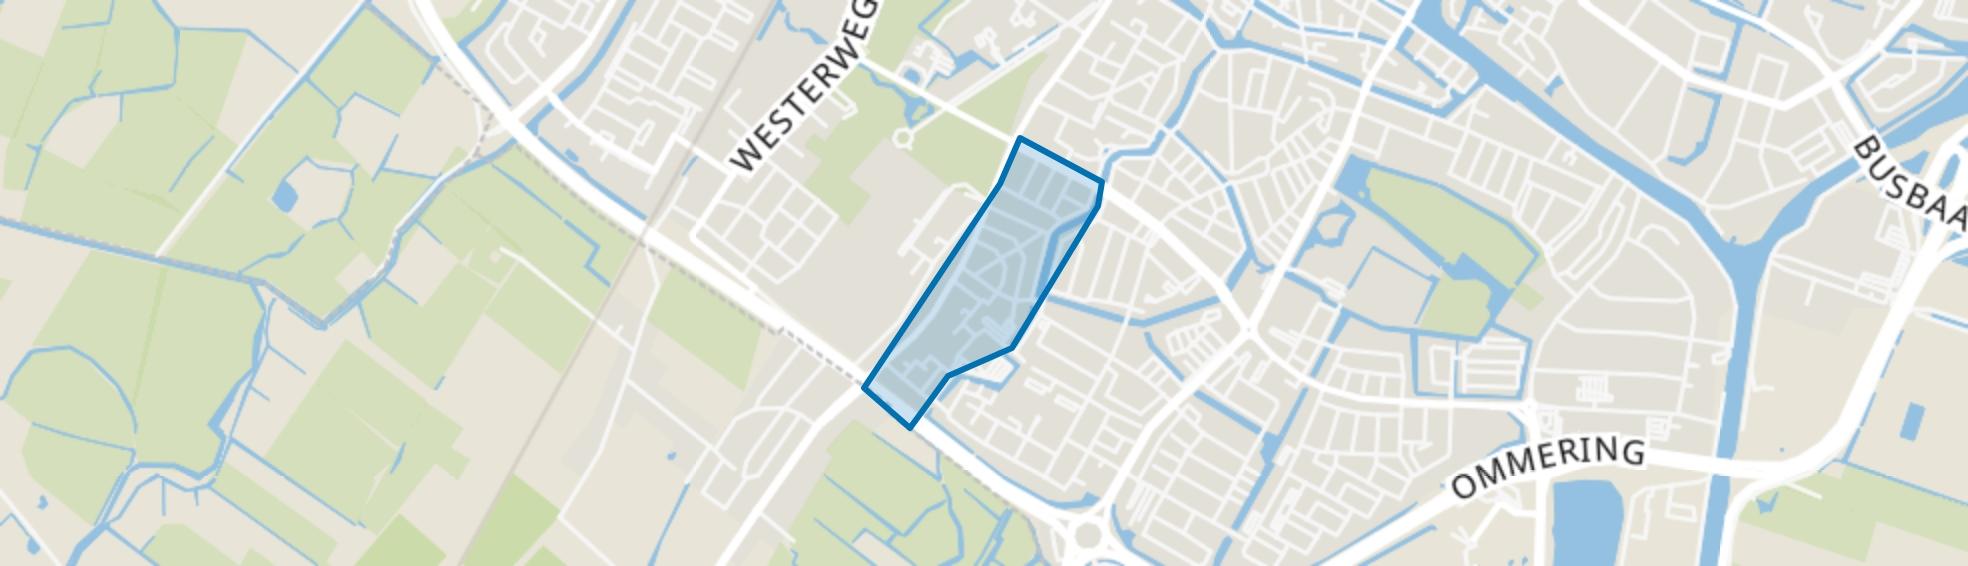 Burgemeesterskwartier, Alkmaar map